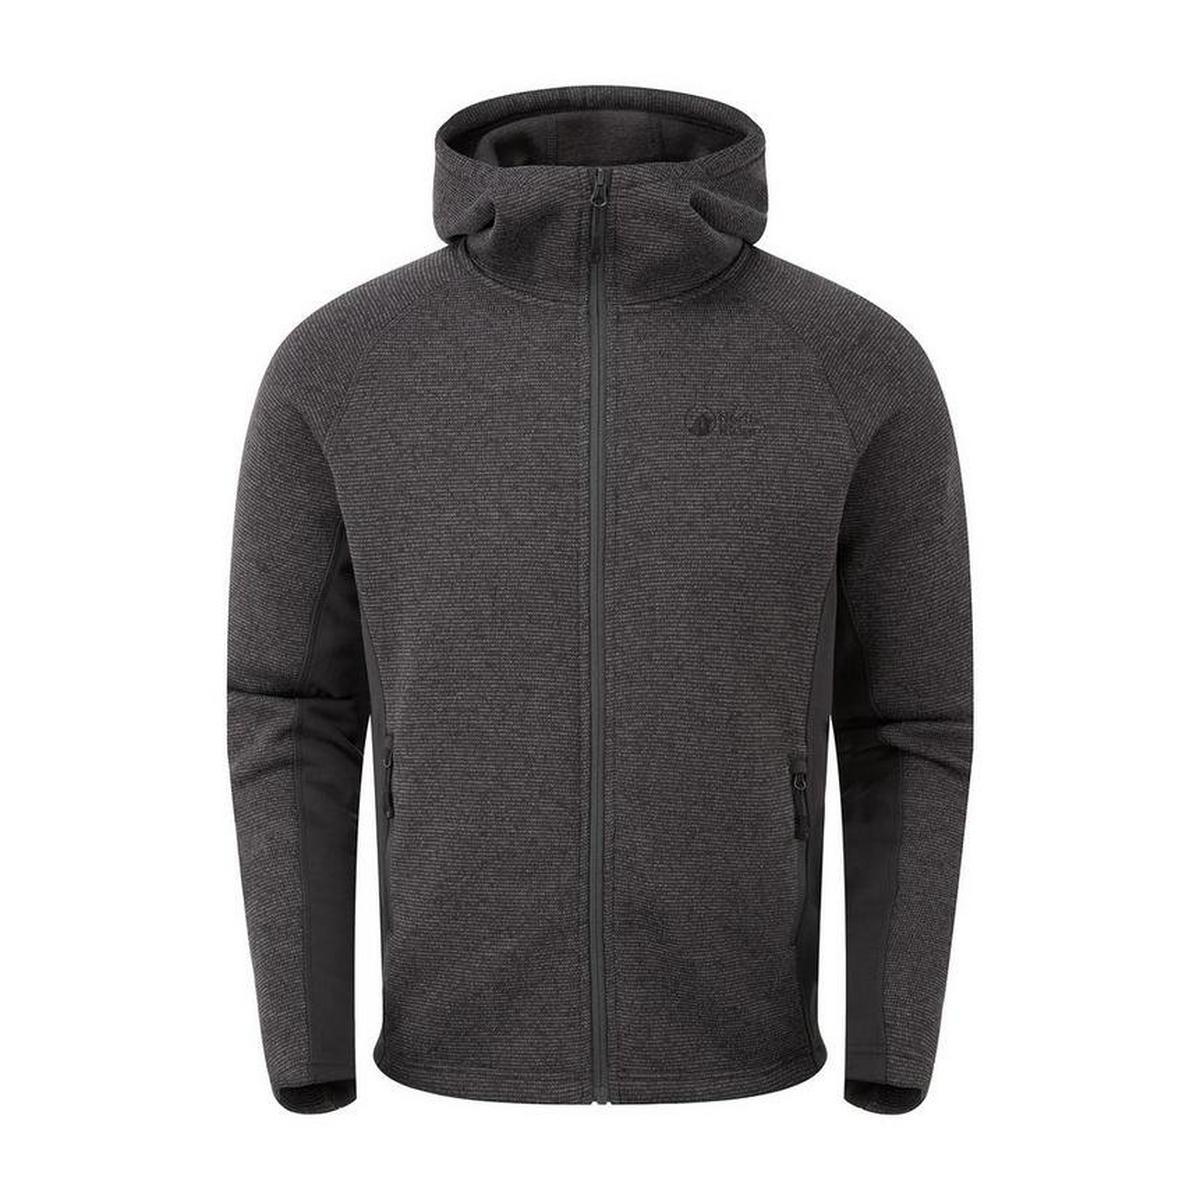 North Ridge Men's North Ridge Atlas Textured FZ Jacket - Grey